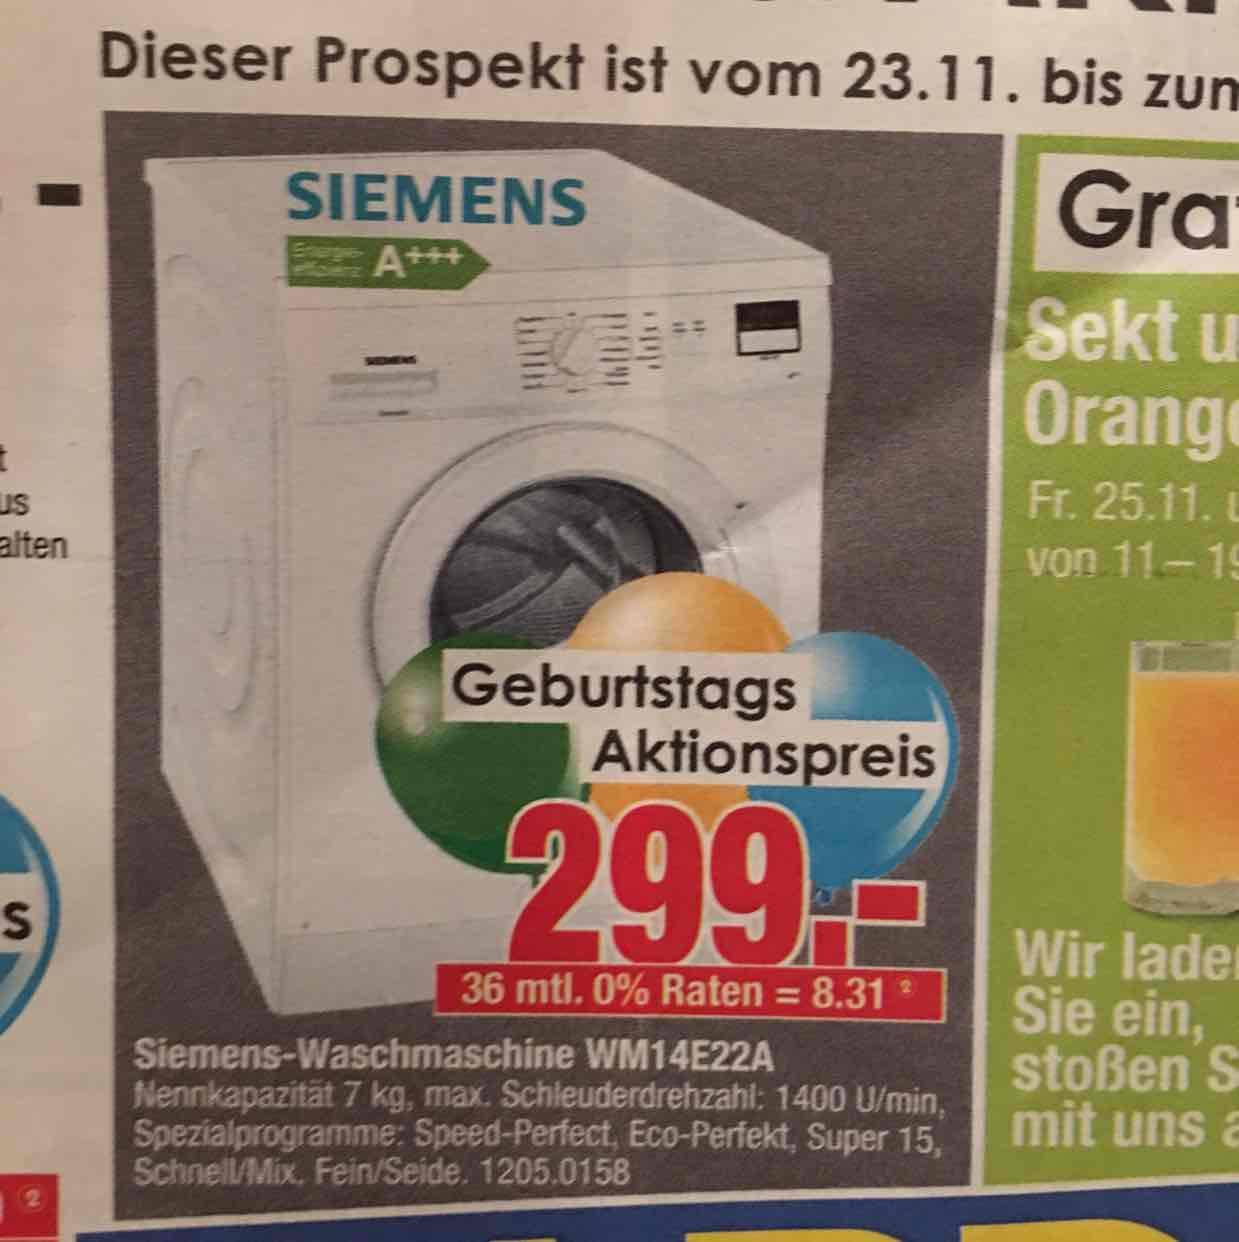 Lokal in Bochum Möbel hardeck Siemens Waschmaschine WM14E22A